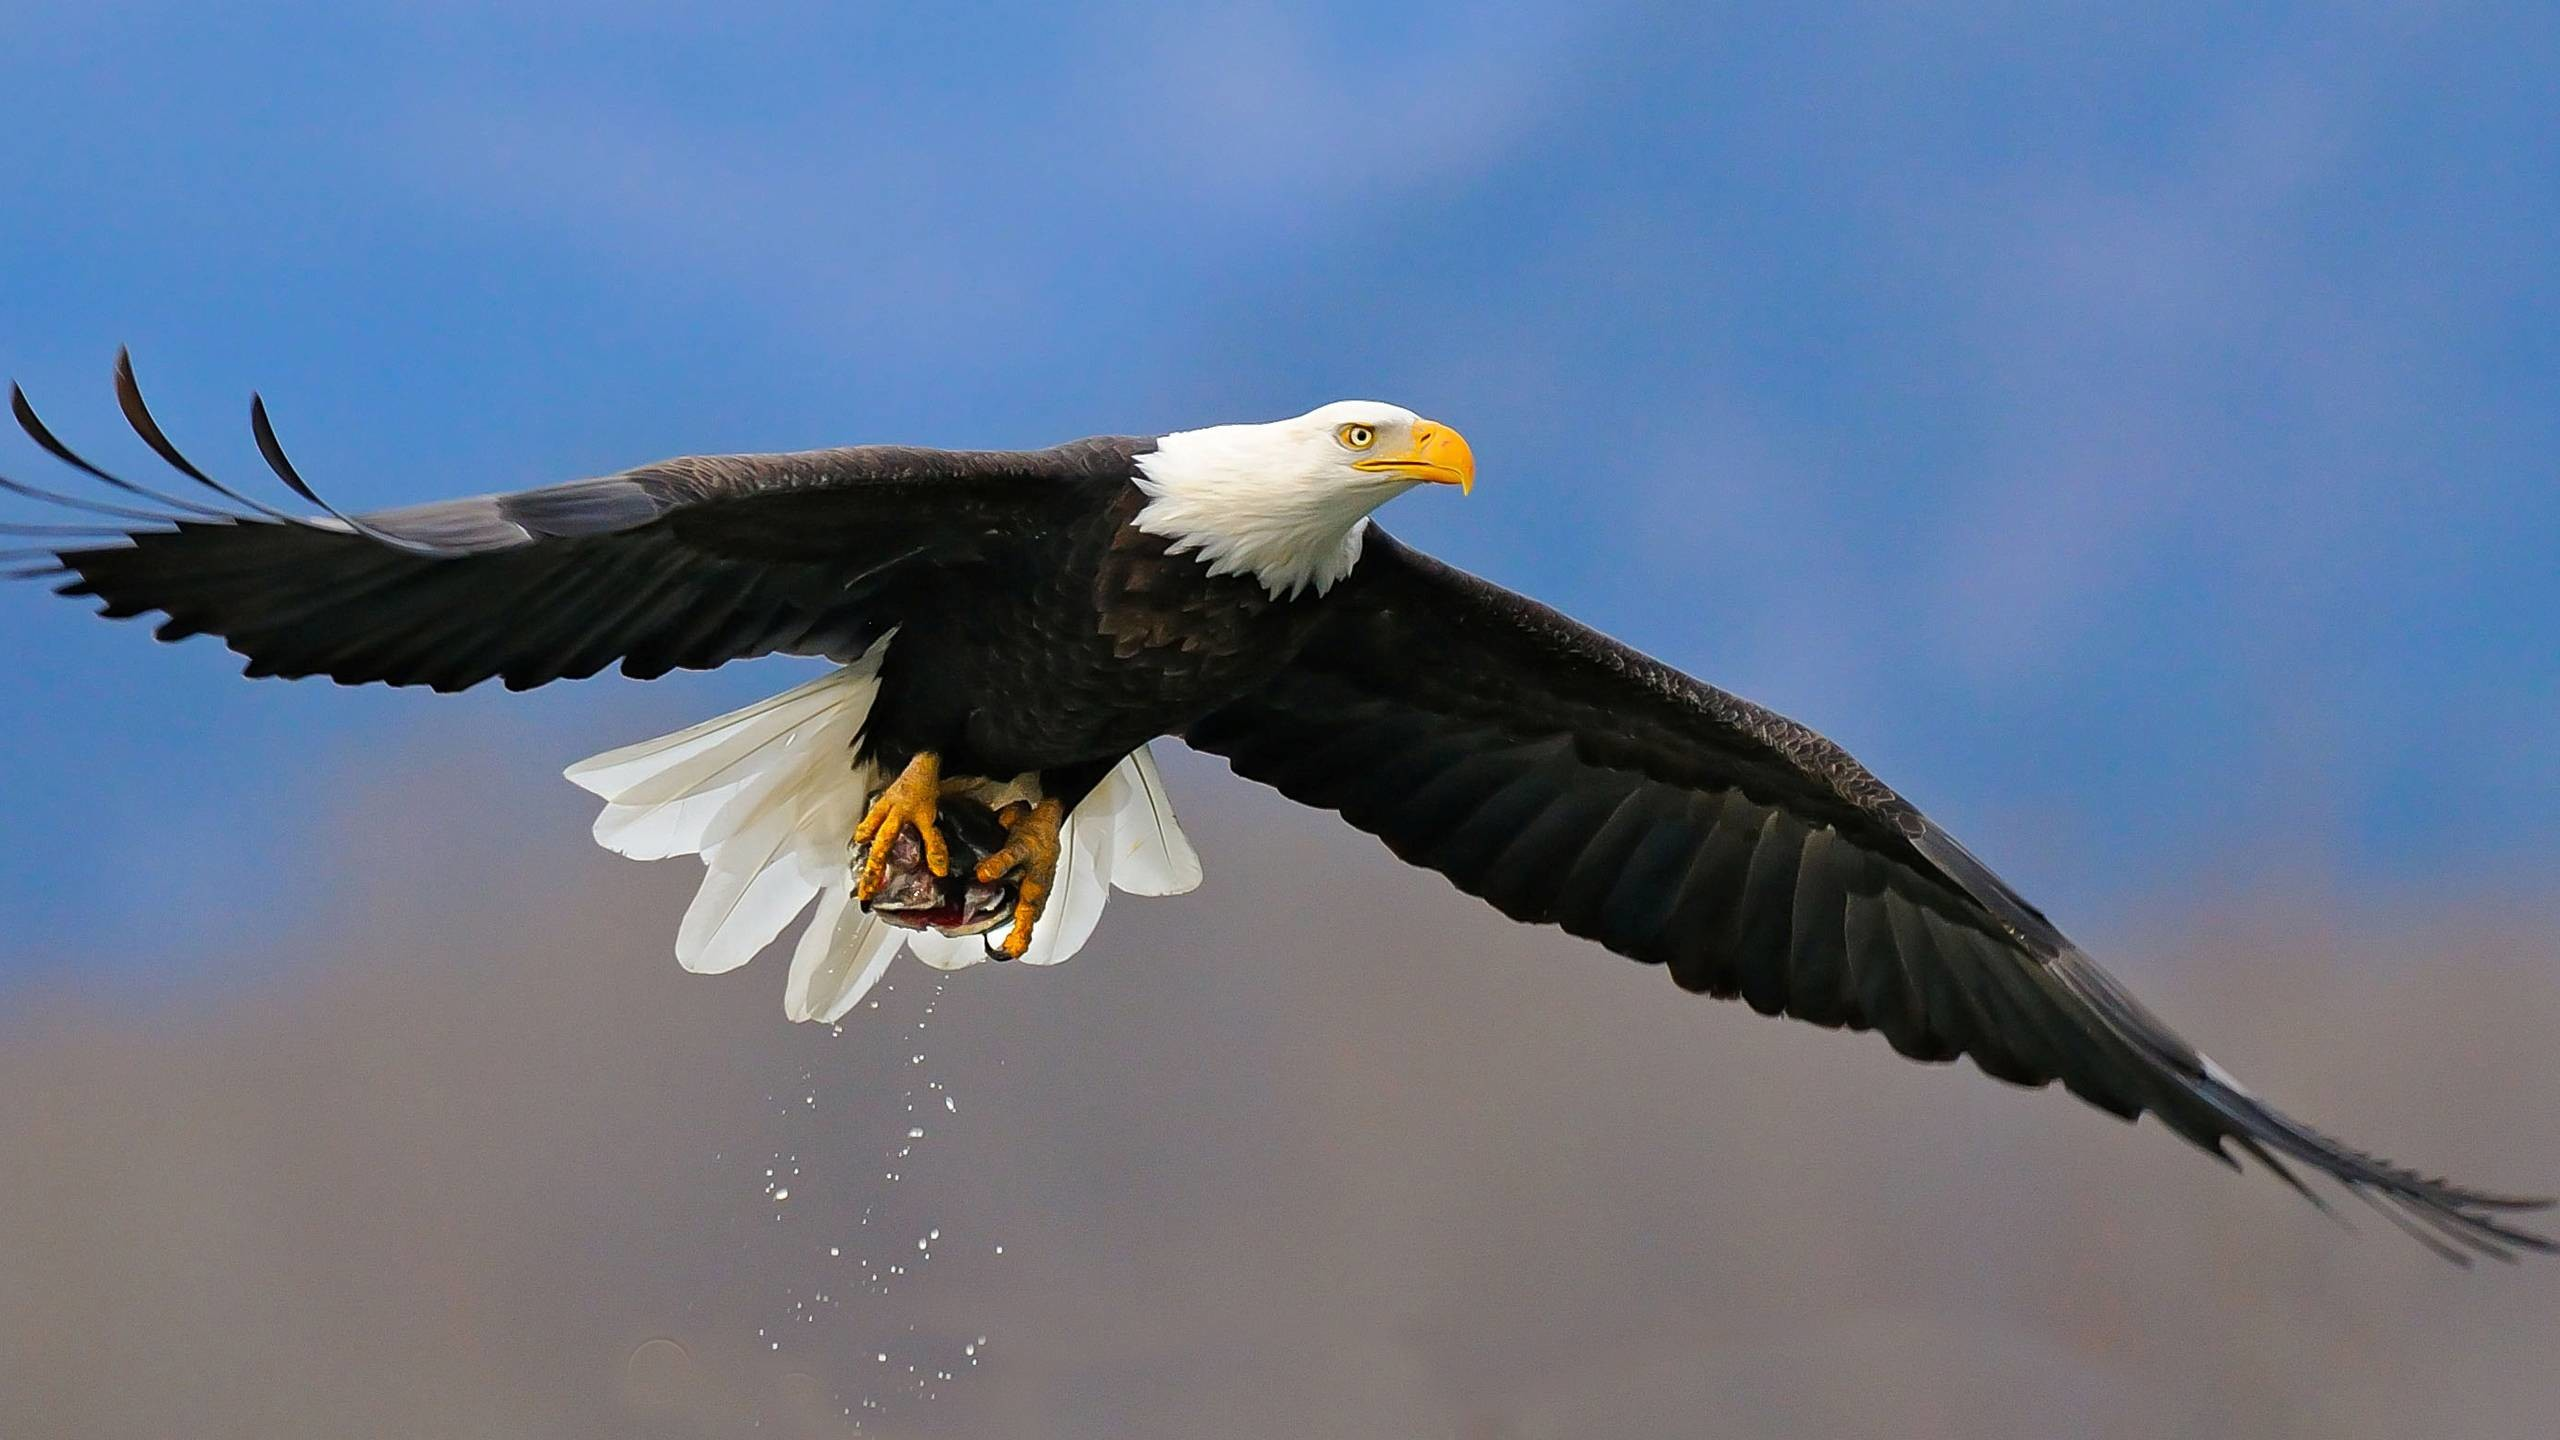 Animal Bald Eagle Wallpaper px Free Download .